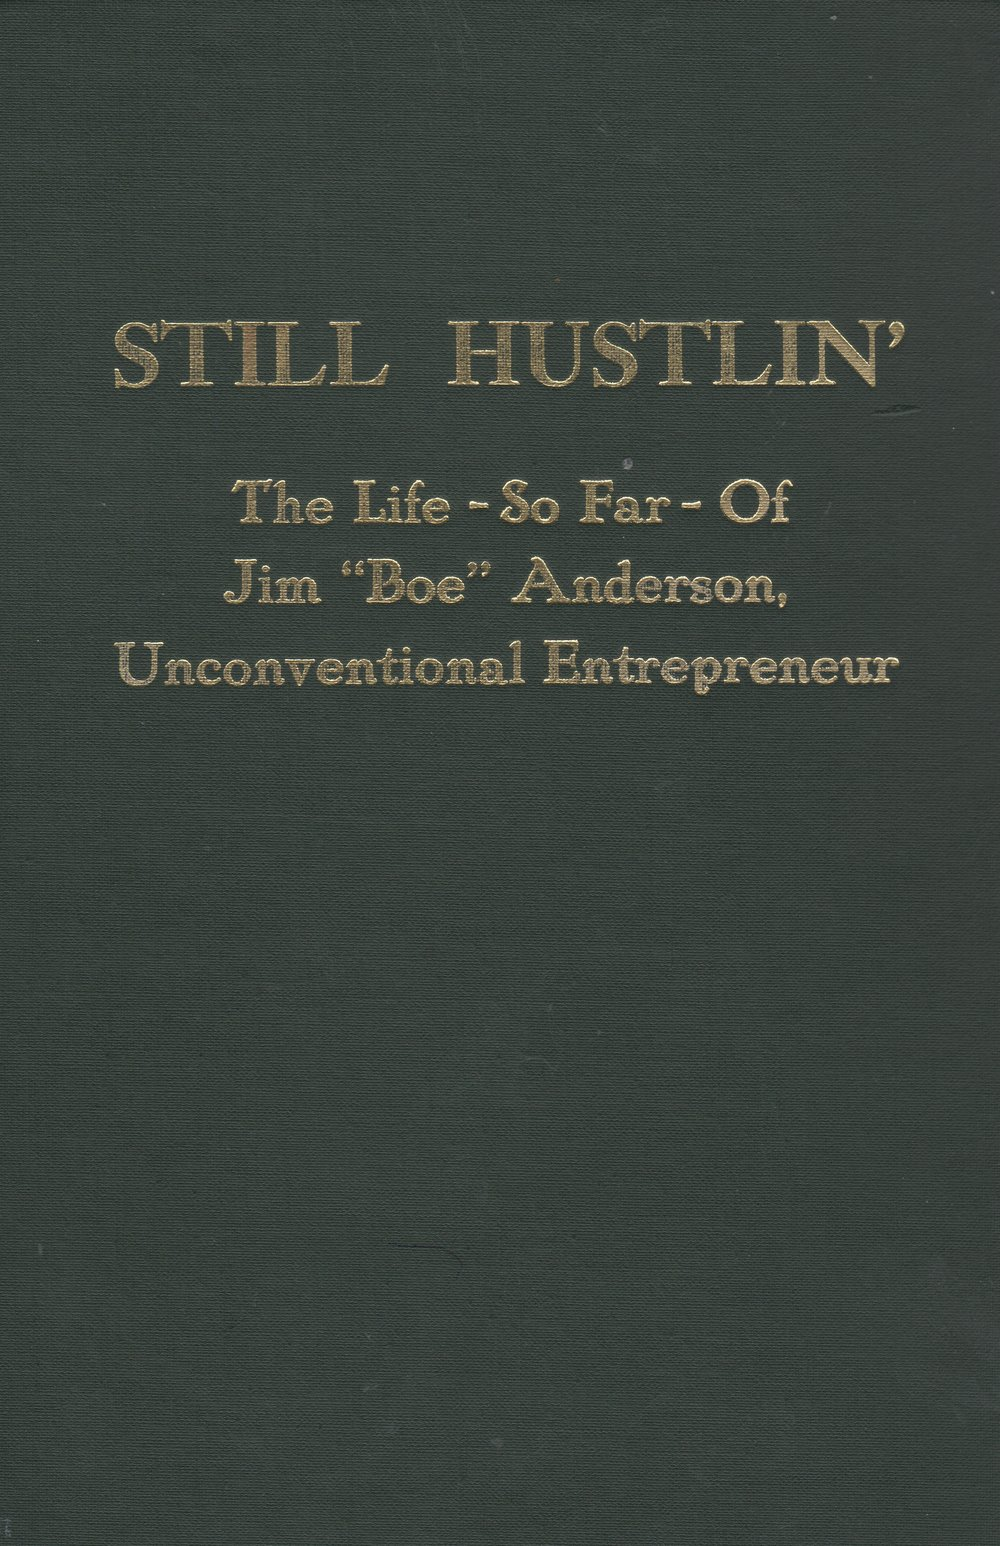 Still Hustlin' cover scanned 600 dpi original.jpeg